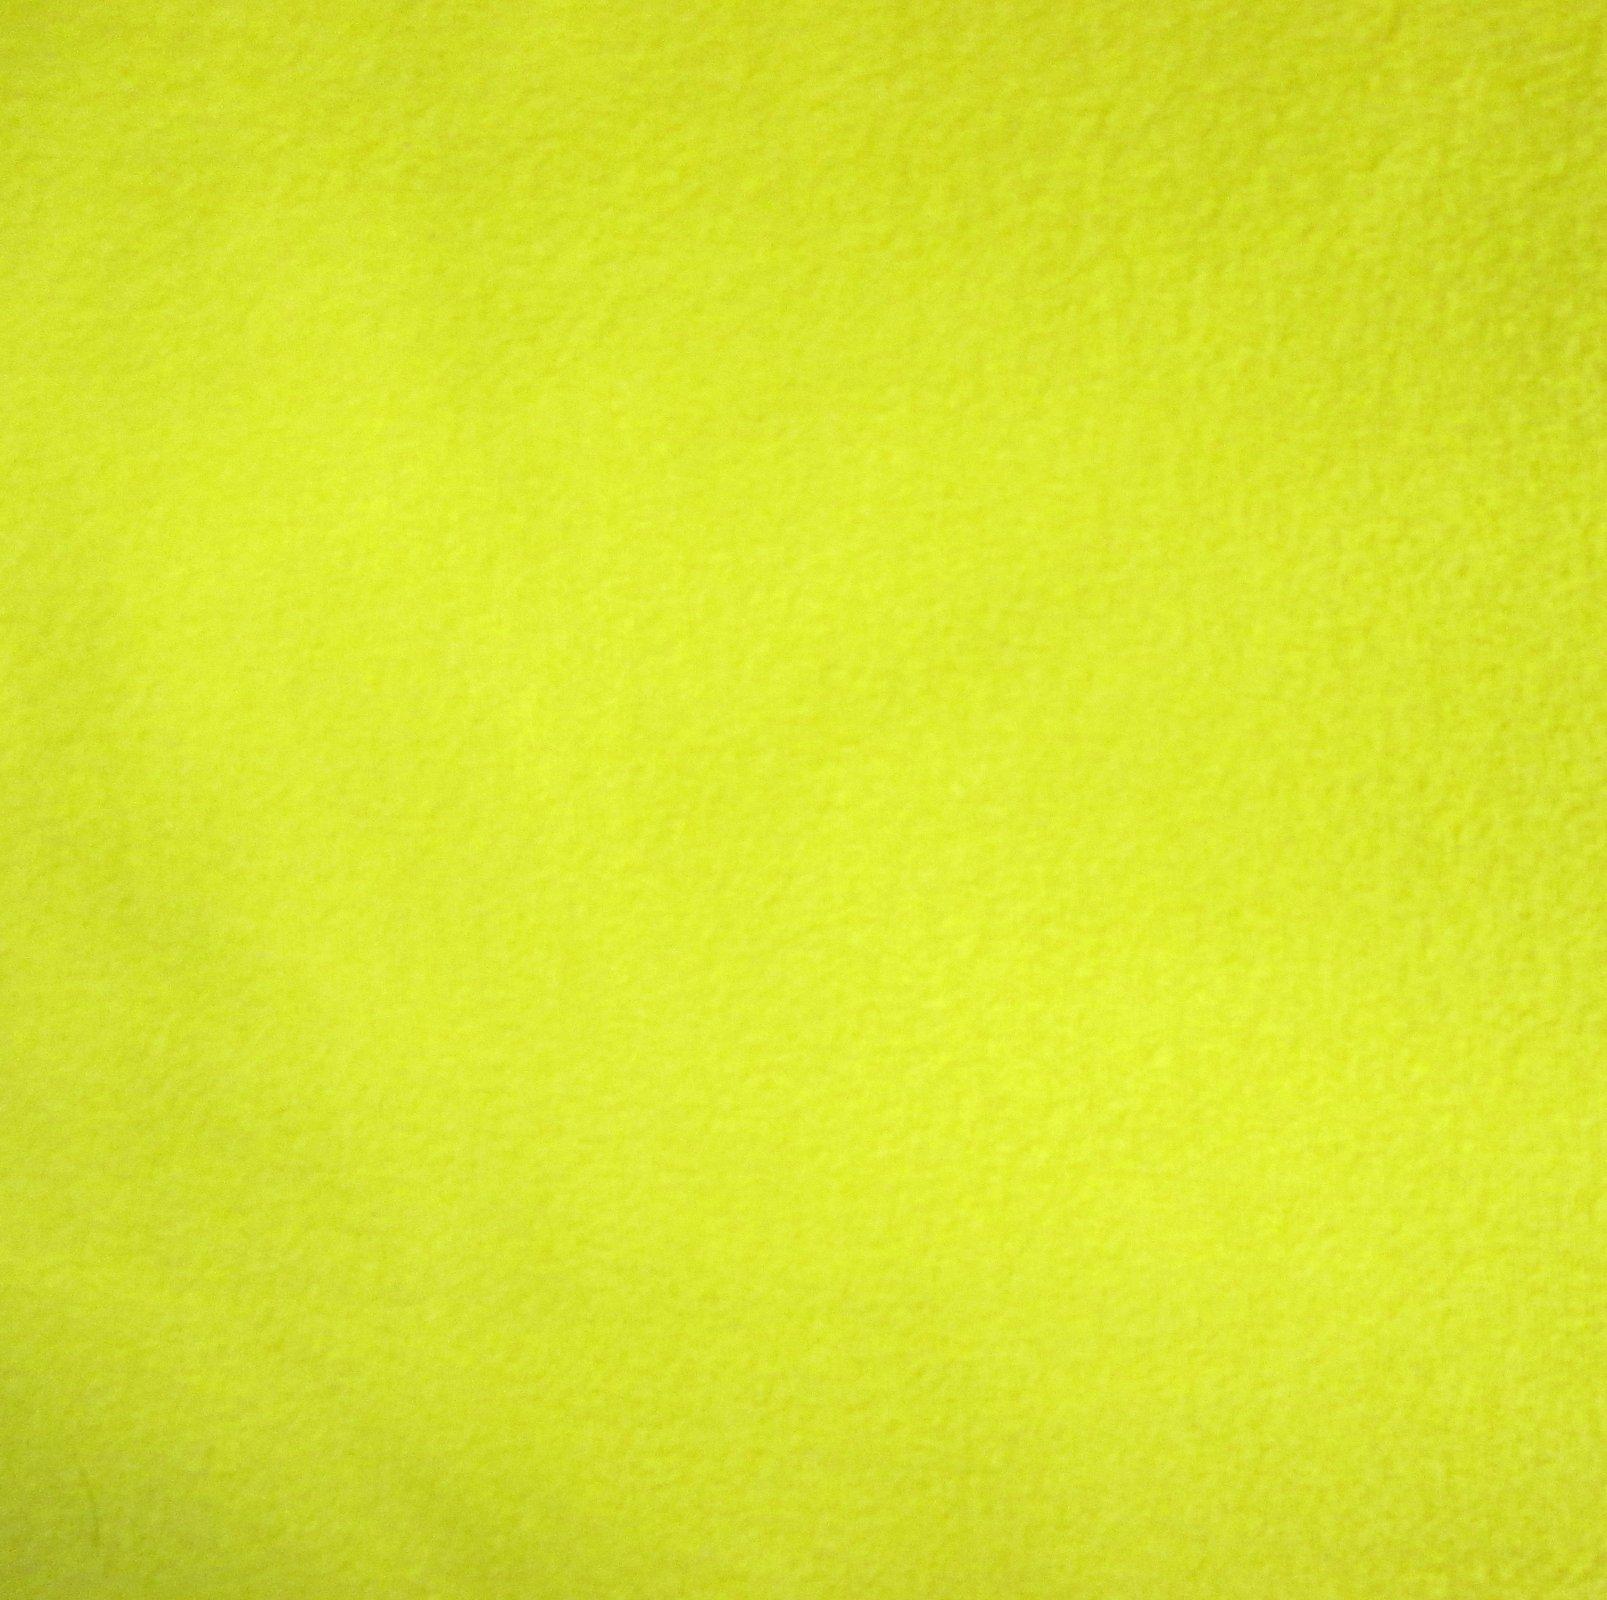 Solid Bright Yellow Fleece